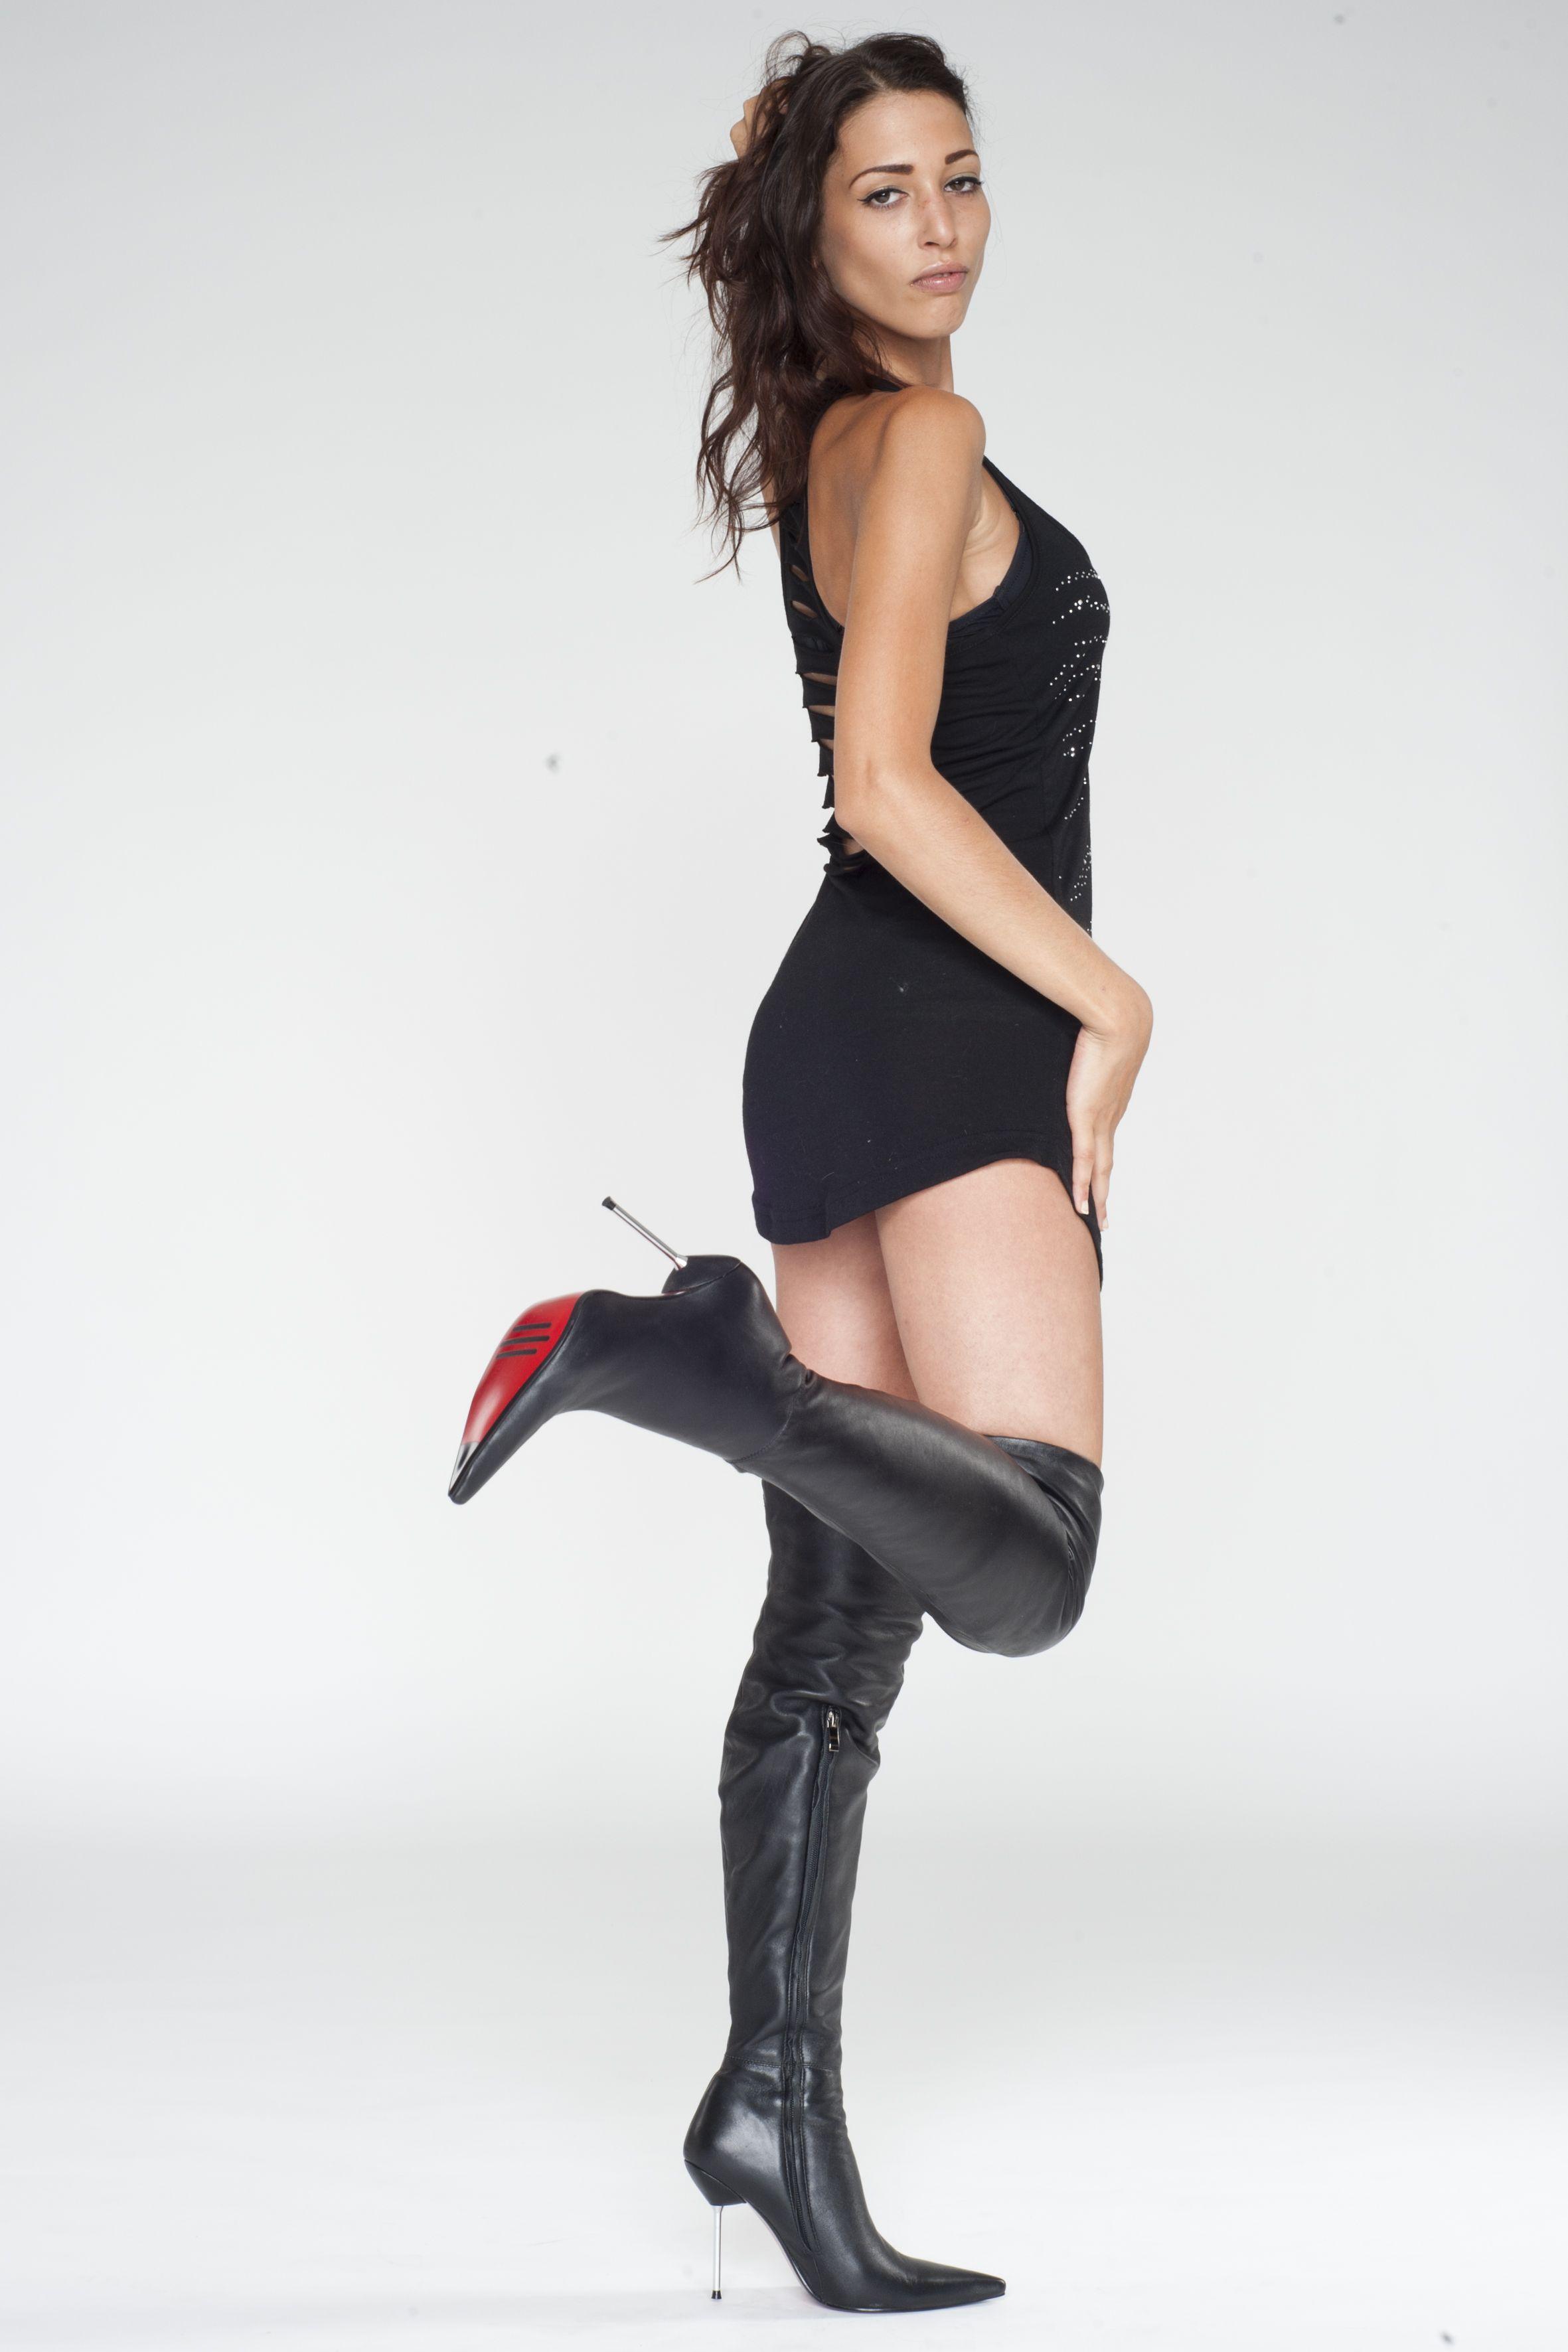 Arollo Leather Heeled Boots 1179a57adcf493508d3ecdb636504f73